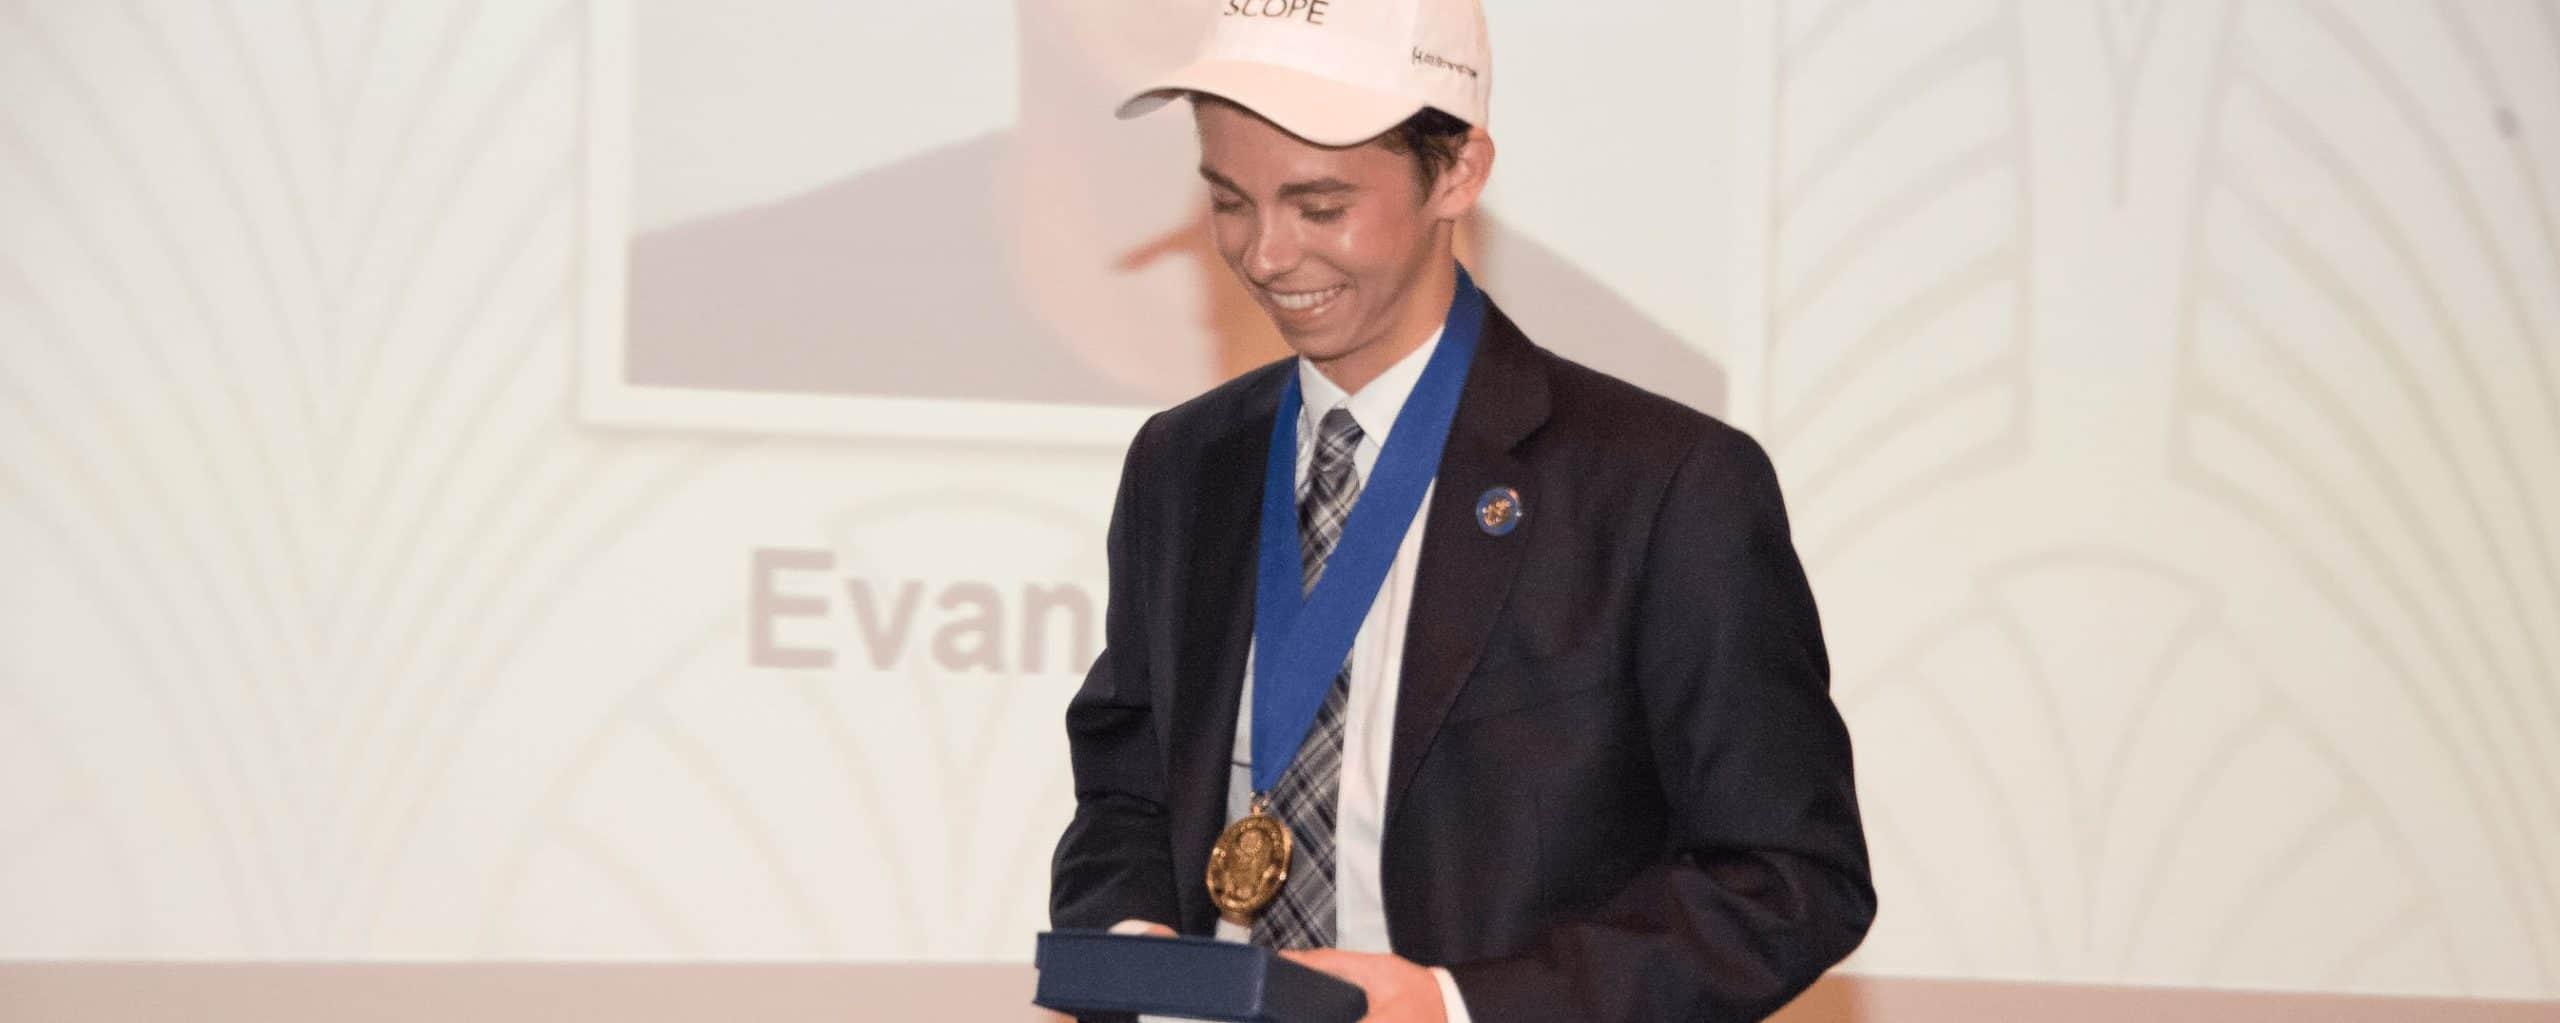 Evan receiving award